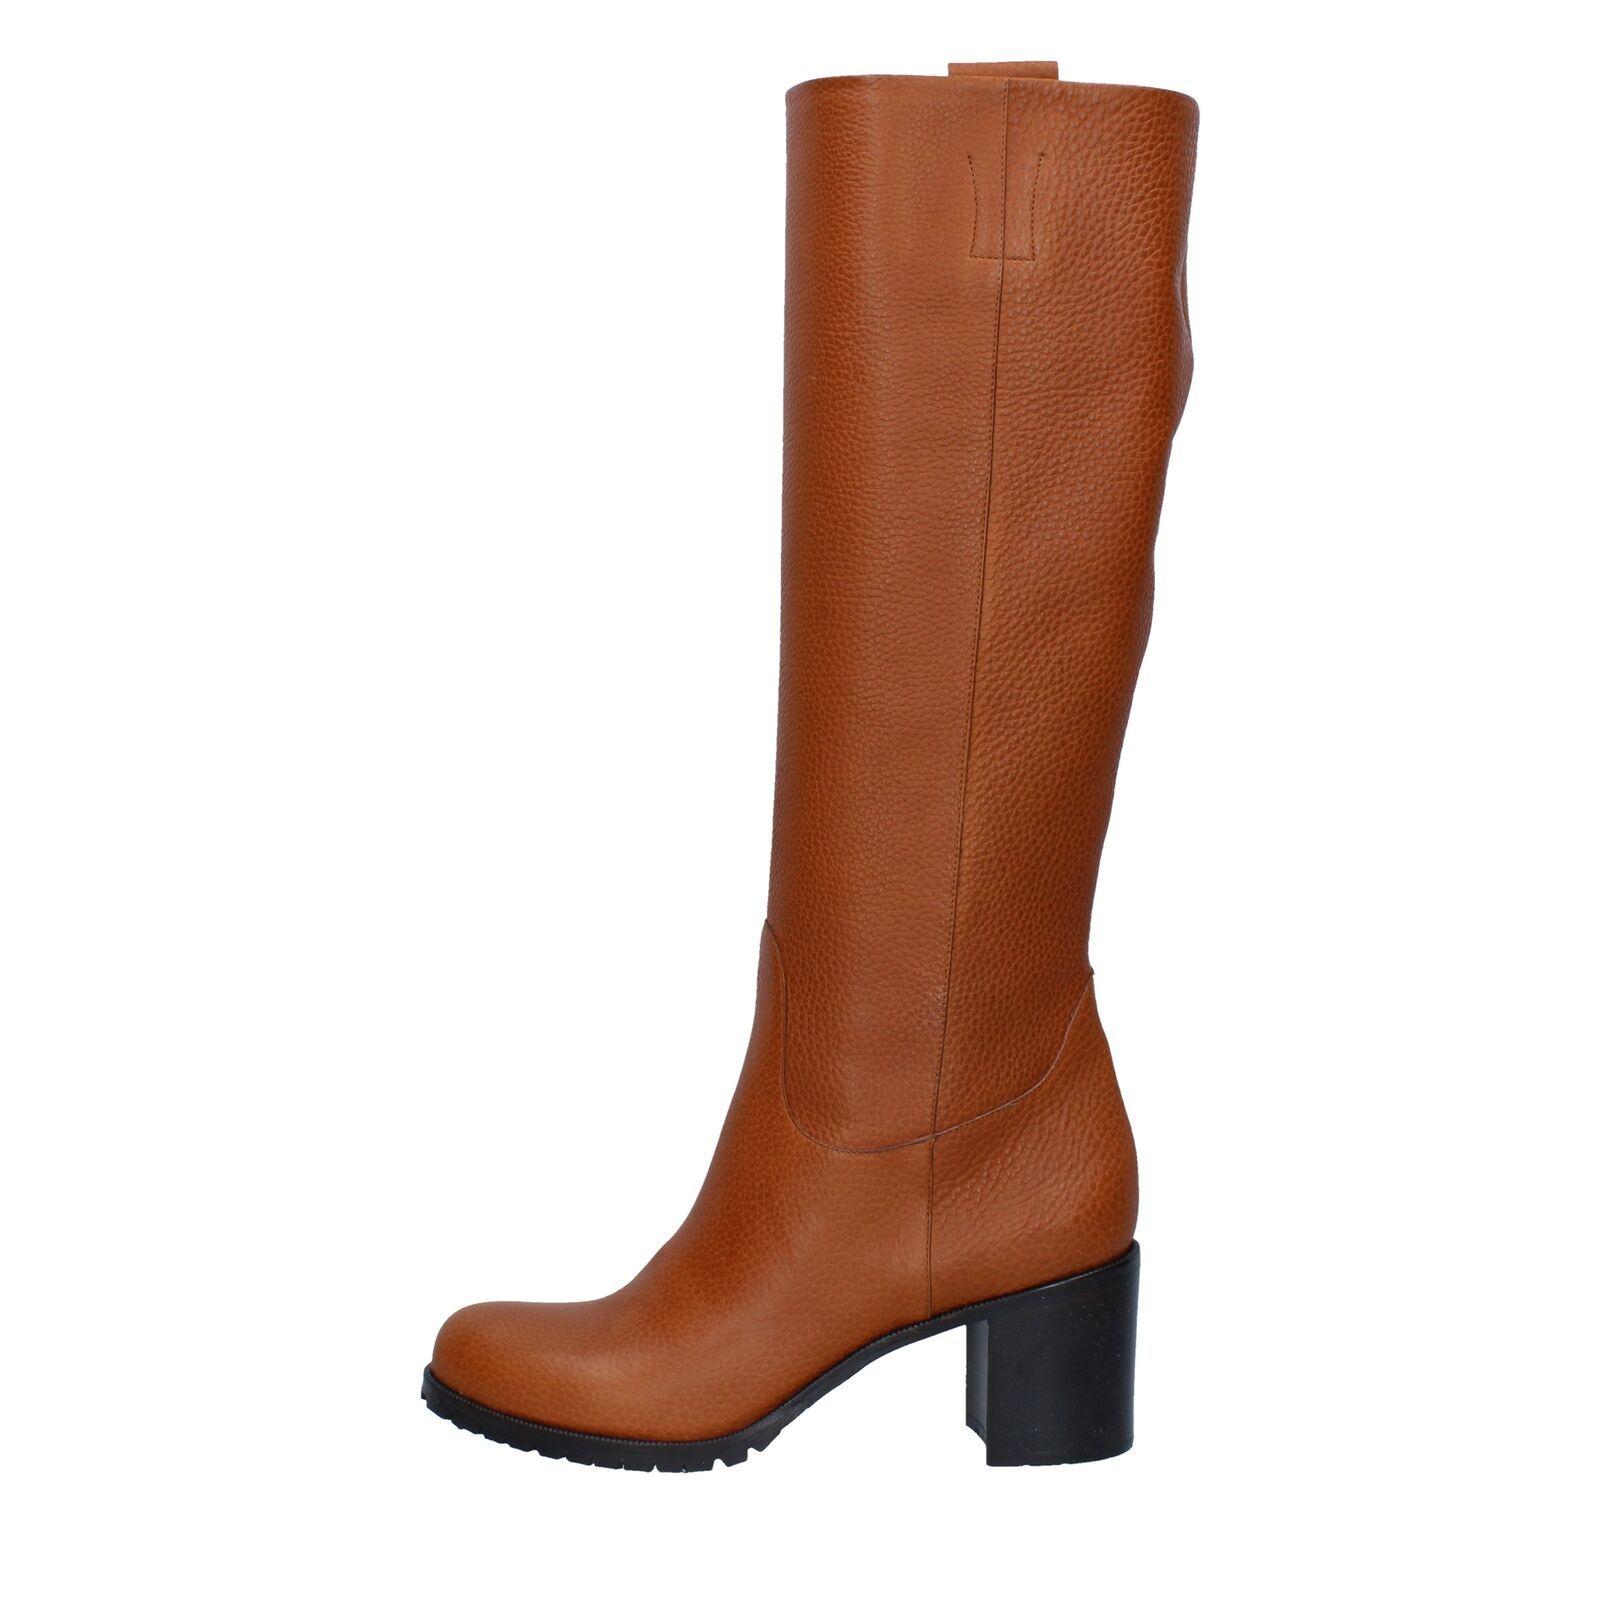 pelle ky564 color cuoio scarpe donna DEIMILLE stivali marrone